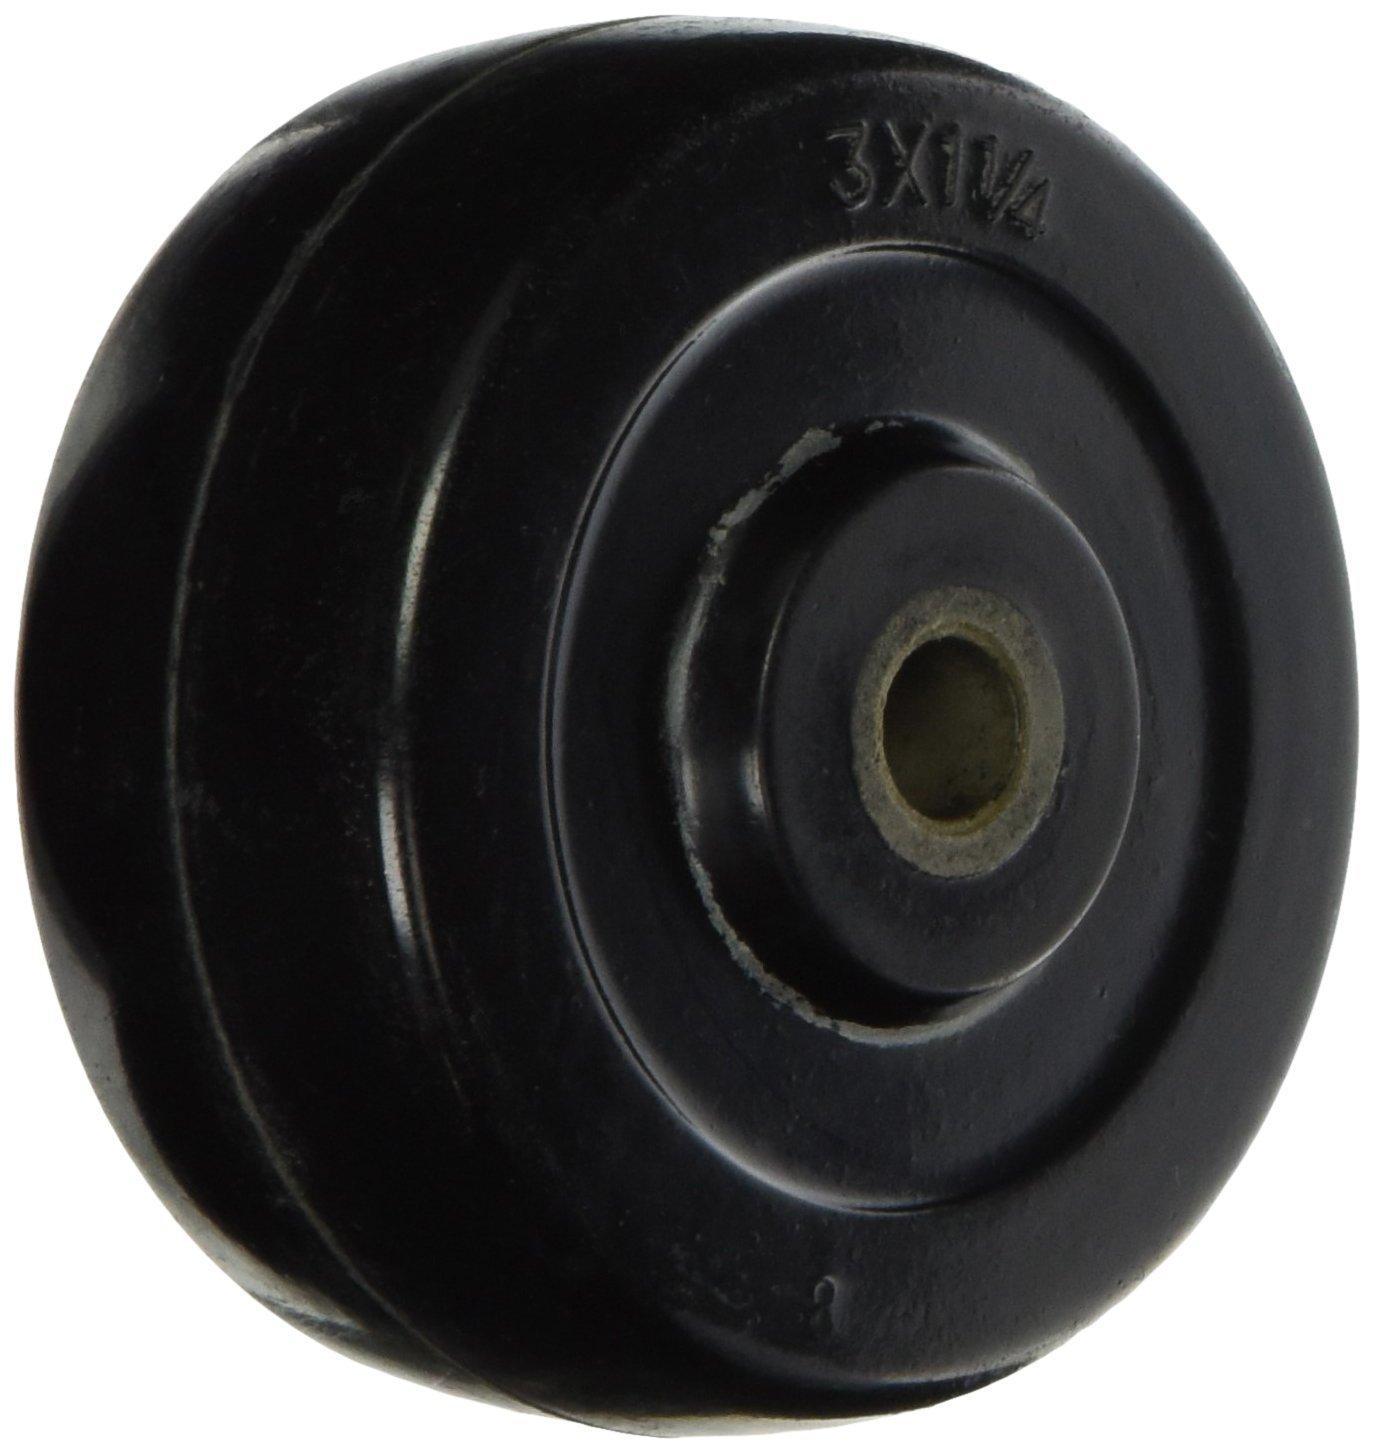 RWM Casters HRO-0312-05-SI 3 x 1-1/4